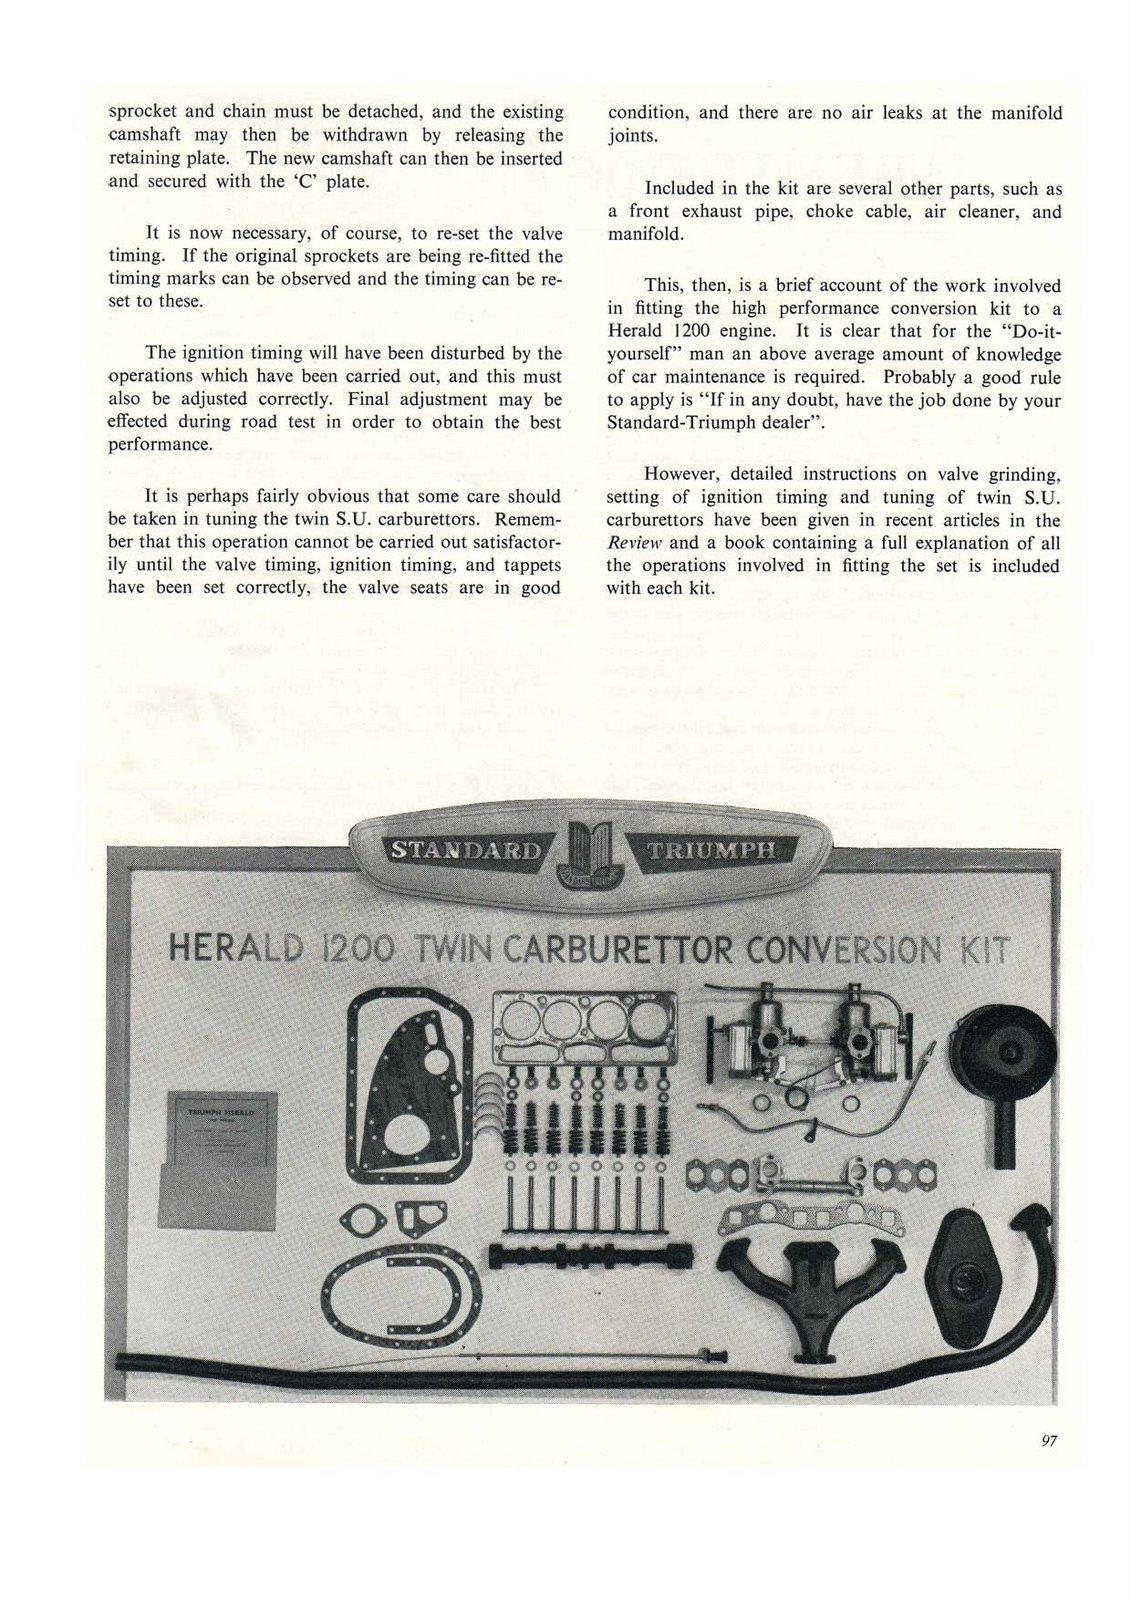 Triumph Herald 1200 Twin